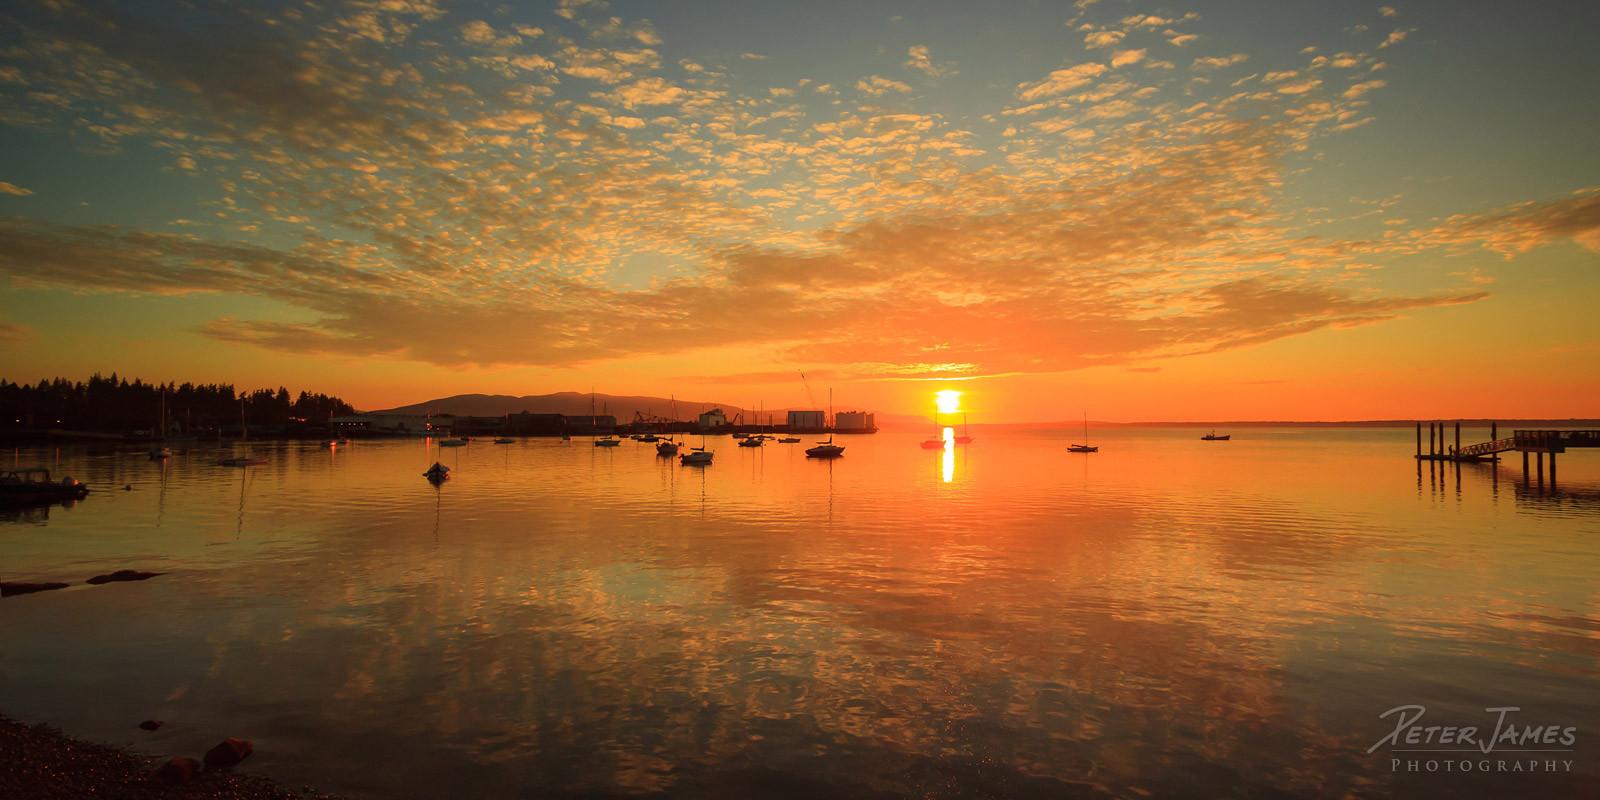 Sunset on Fairhaven Cove